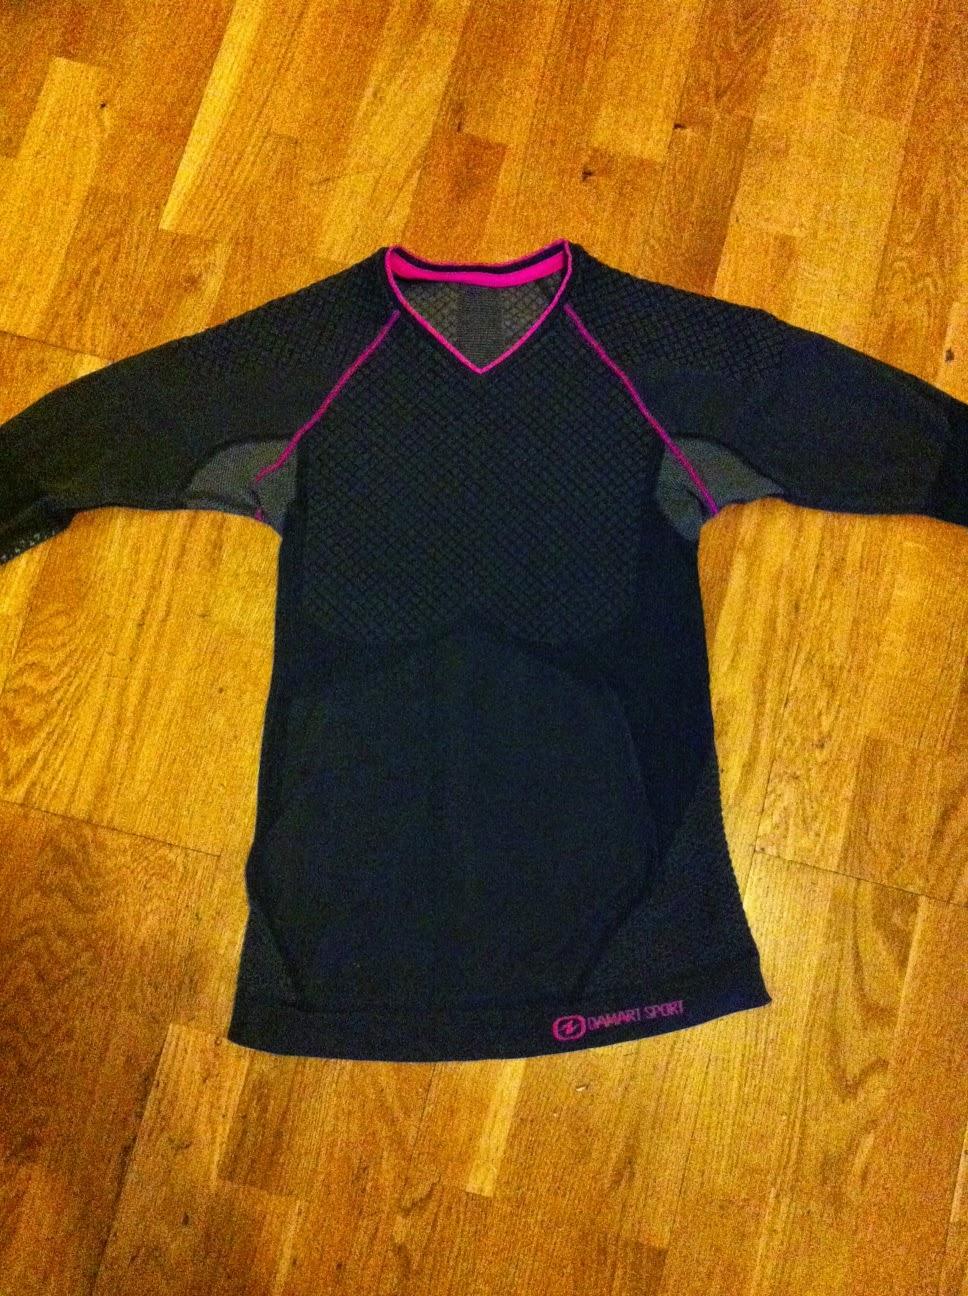 j 39 ai test le t shirt activ body damart sport jeu. Black Bedroom Furniture Sets. Home Design Ideas